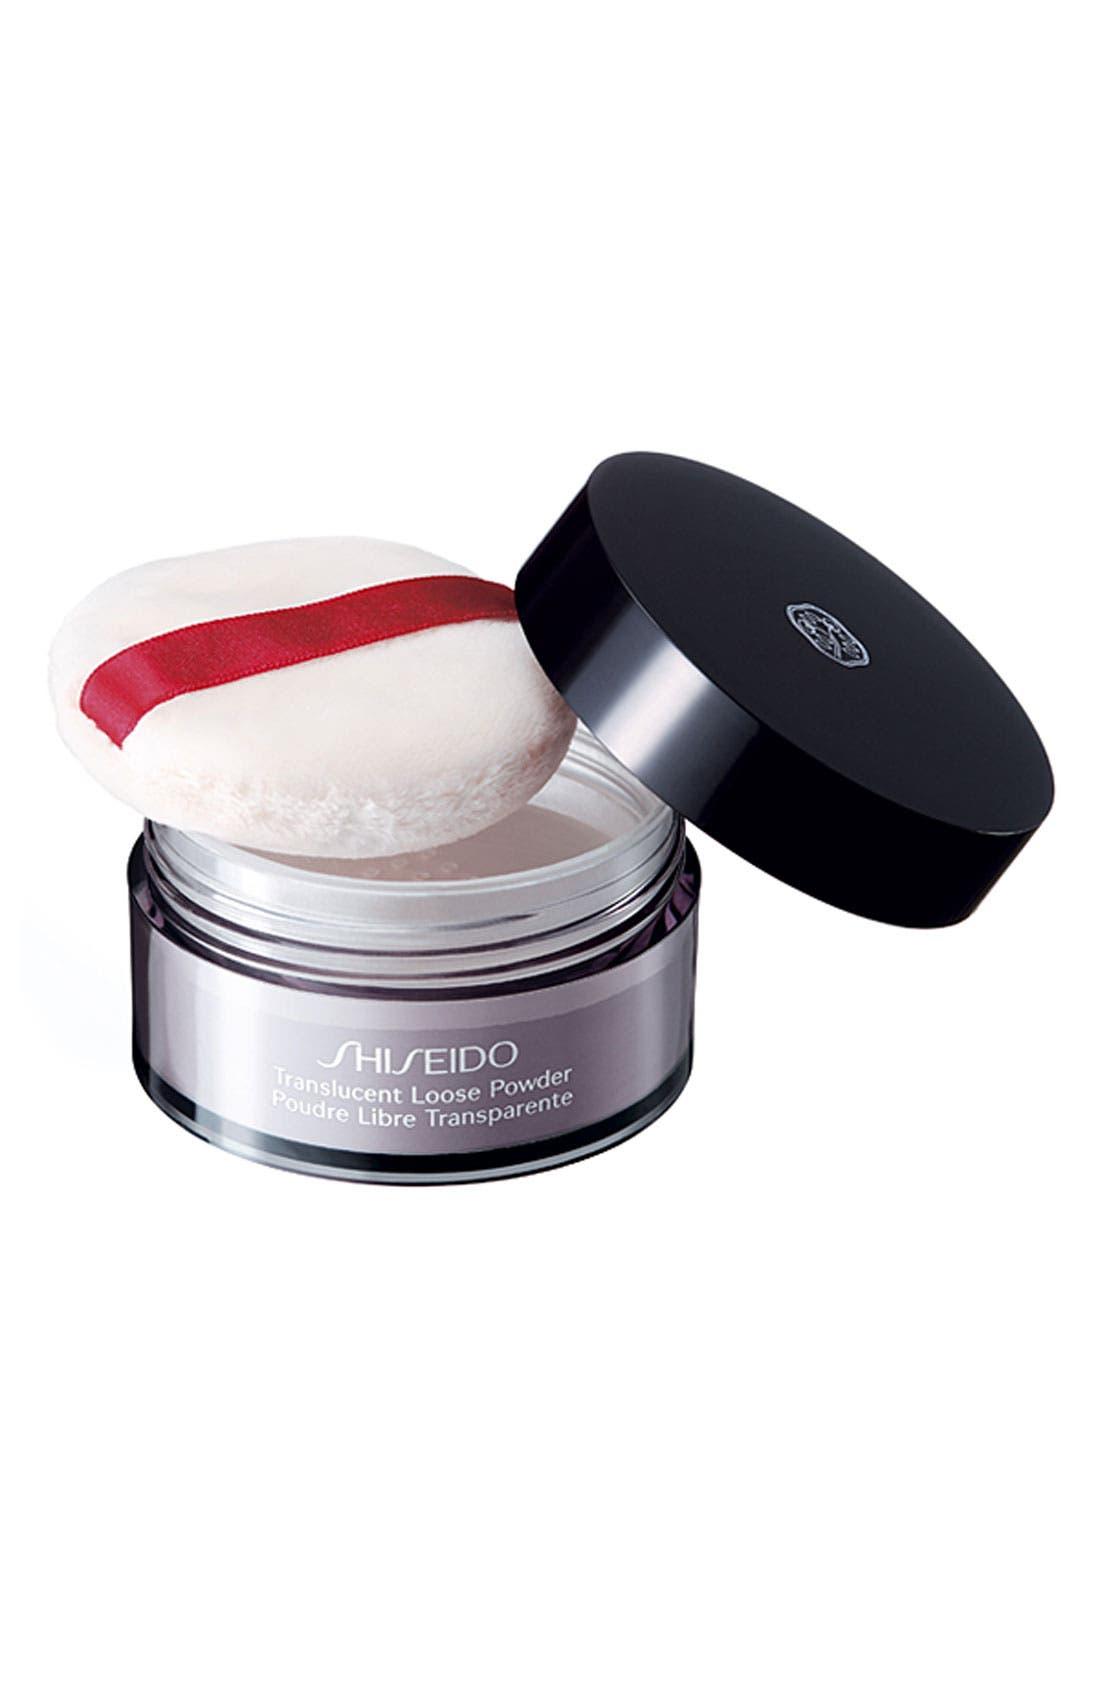 Shiseido 'The Makeup' Translucent Loose Powder